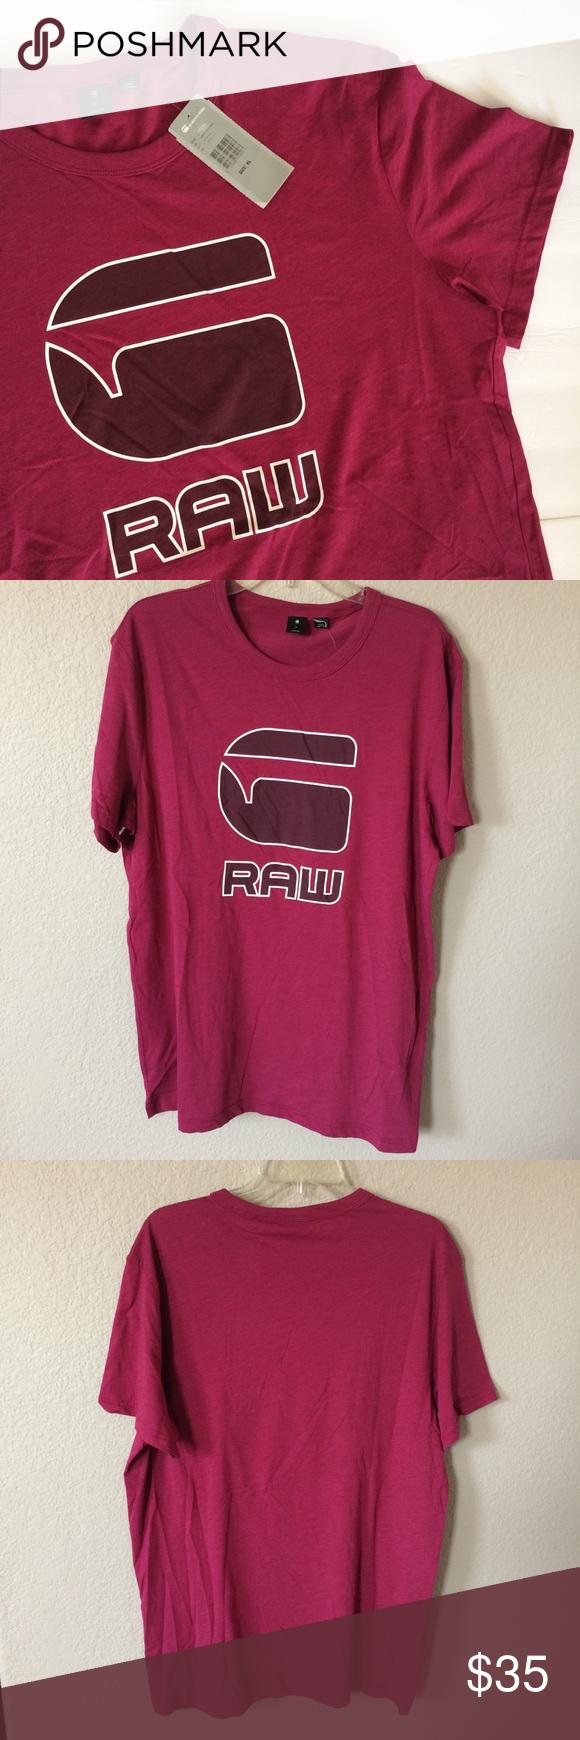 Men S G Star Raw Logo Maroon Dark Finch T Shirt G Star G Star Raw Shirts